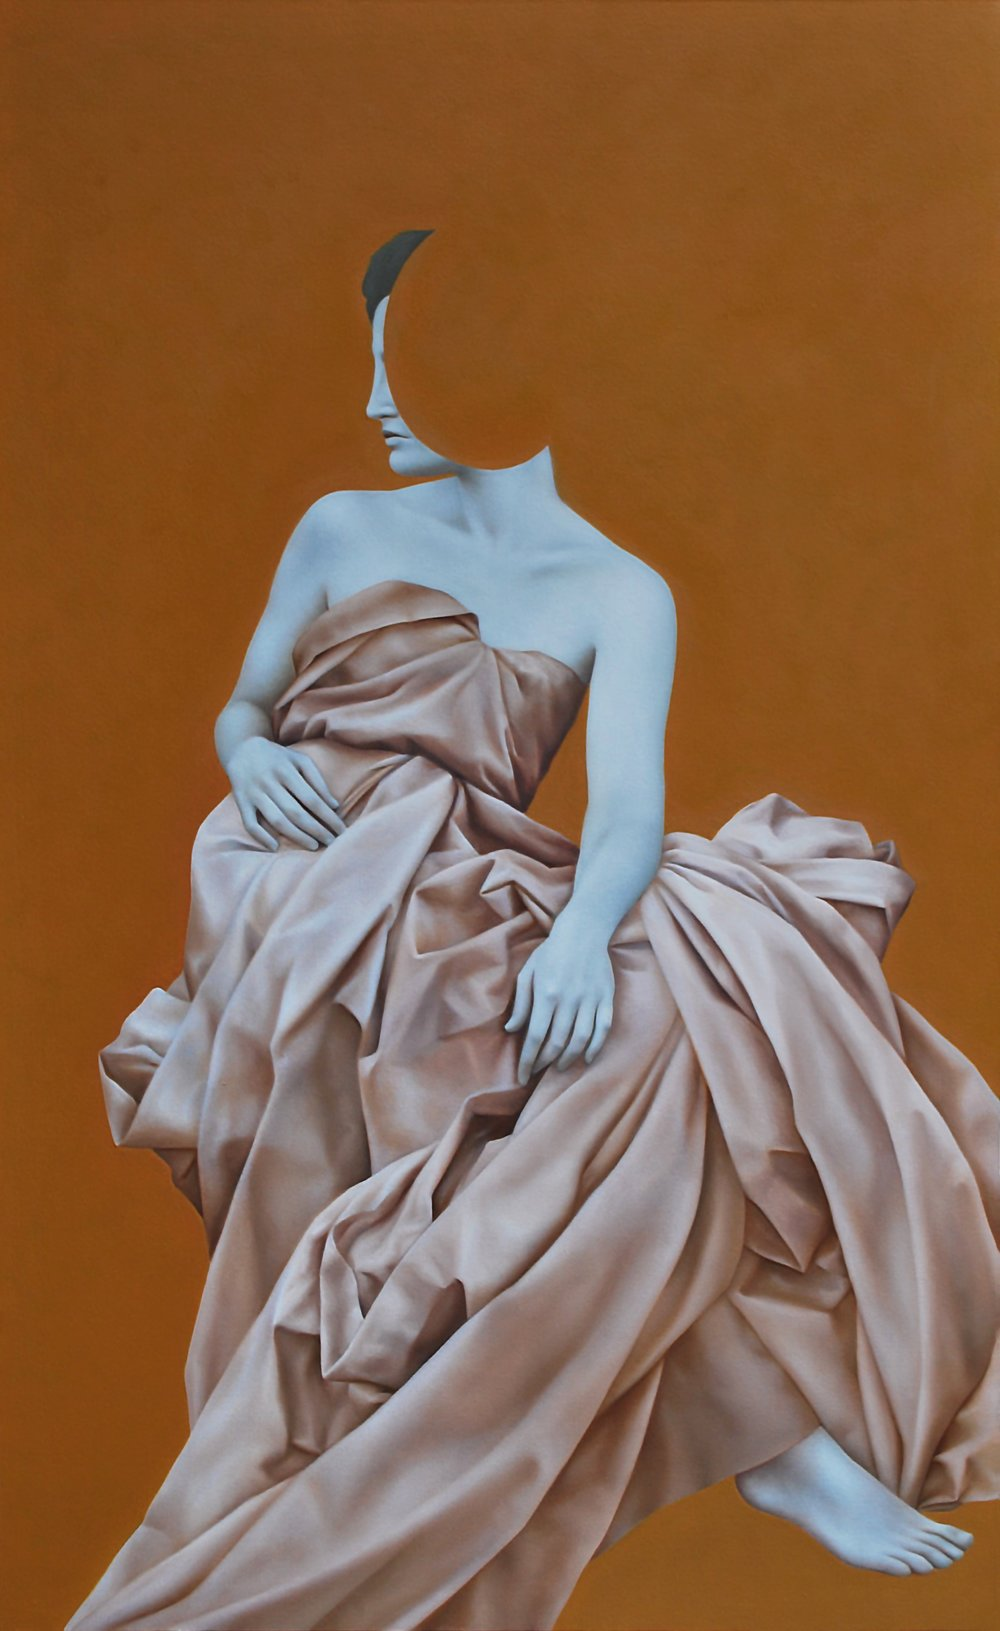 Koios Gold, oil on canvas, 160 x 100 cm, 2016